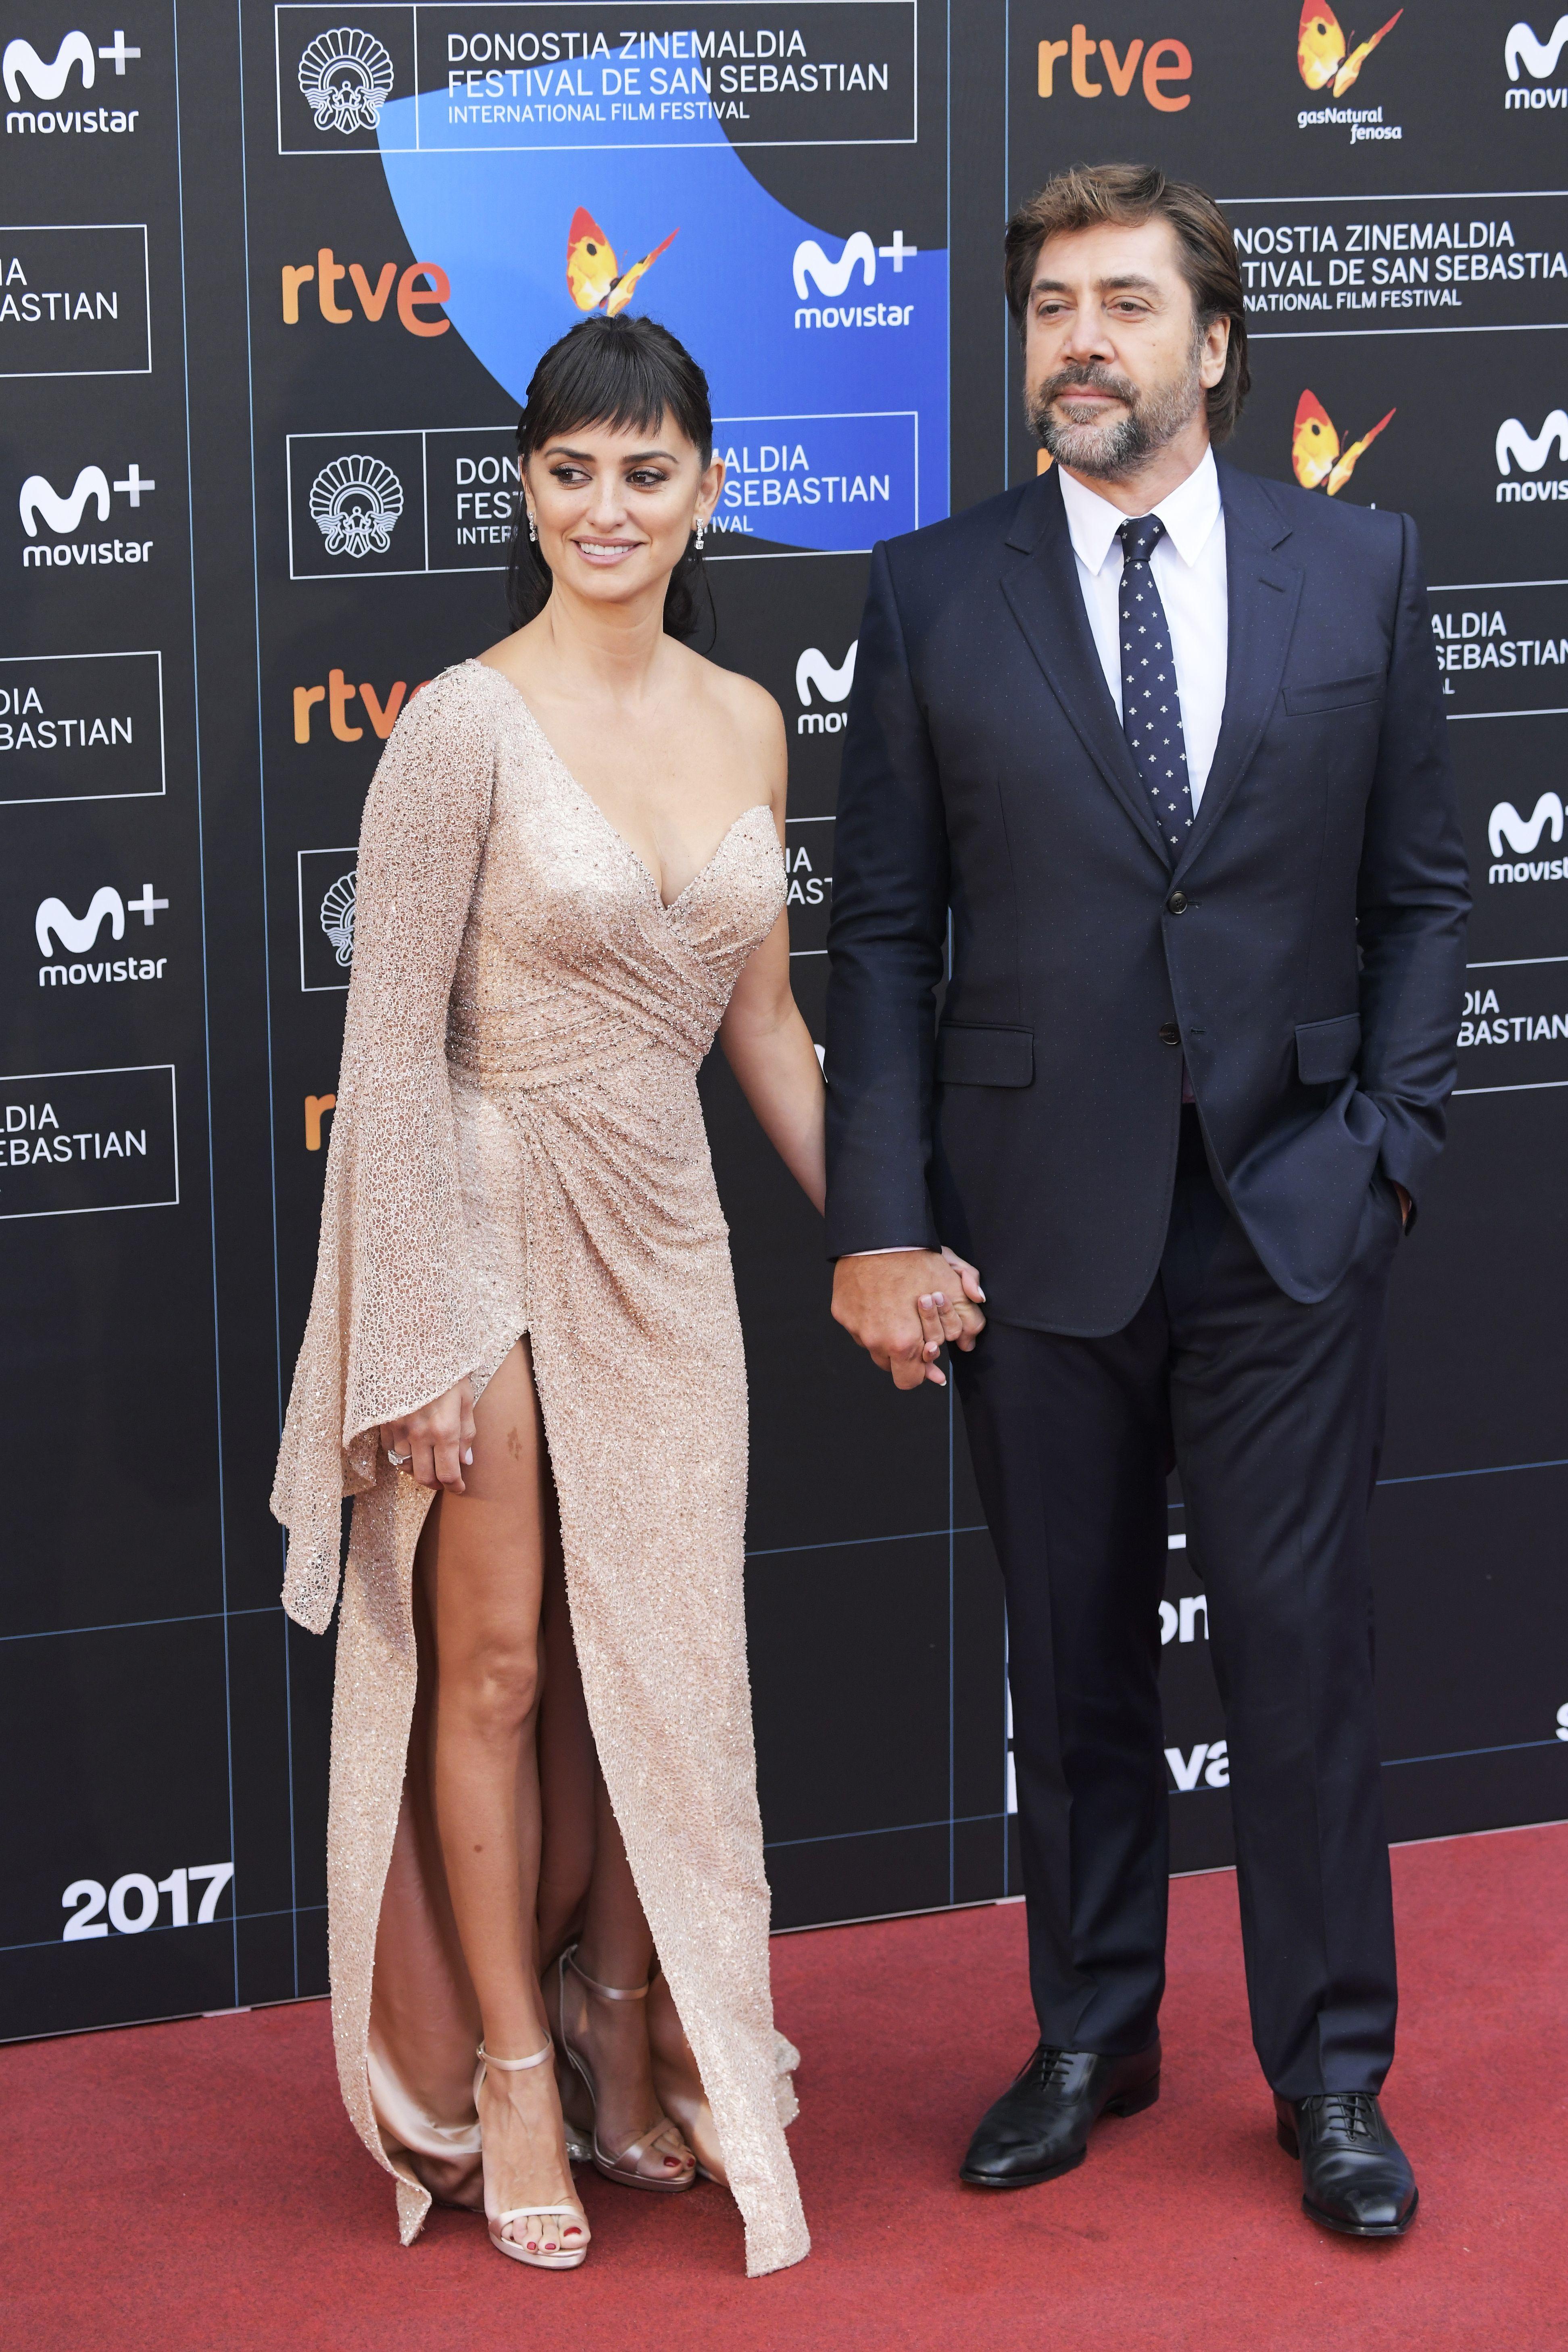 "Penelope Cruz and Javier Bardem hold hands during the 65th San Sebastian Film Festival premiere of ""Loving Pablo"" in Spain on Sept. 30, 2017."